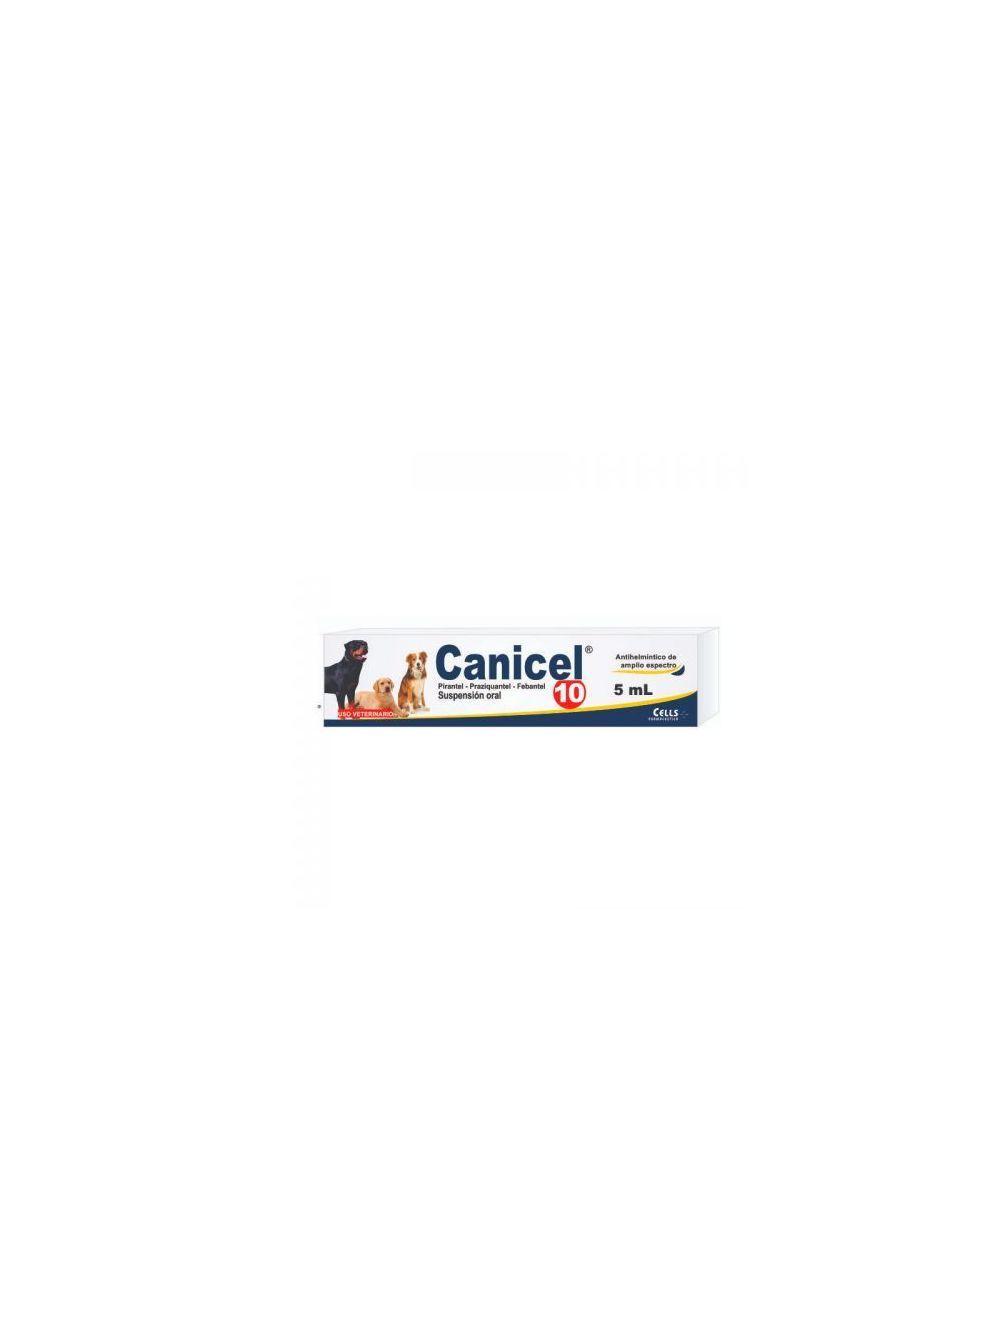 Canicel 10 Antiparasitario Perros 2ml-Ciudaddemascotas.com